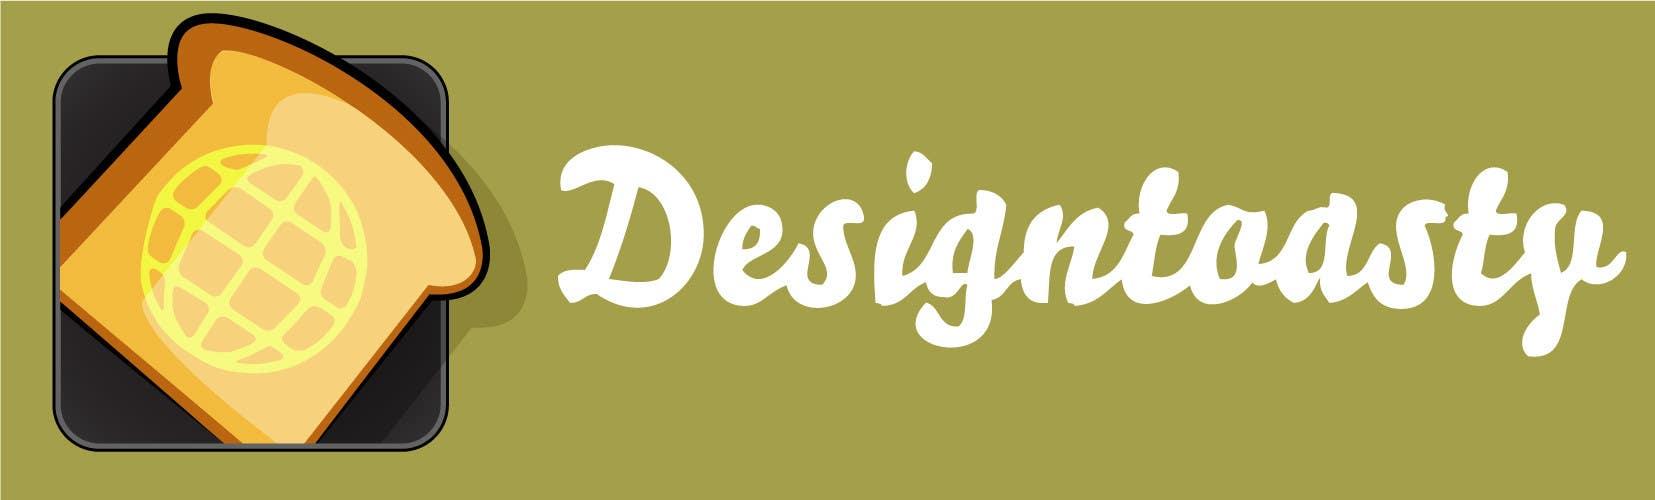 Bài tham dự cuộc thi #7 cho Design Logo-Icons like Envato Marktplaces